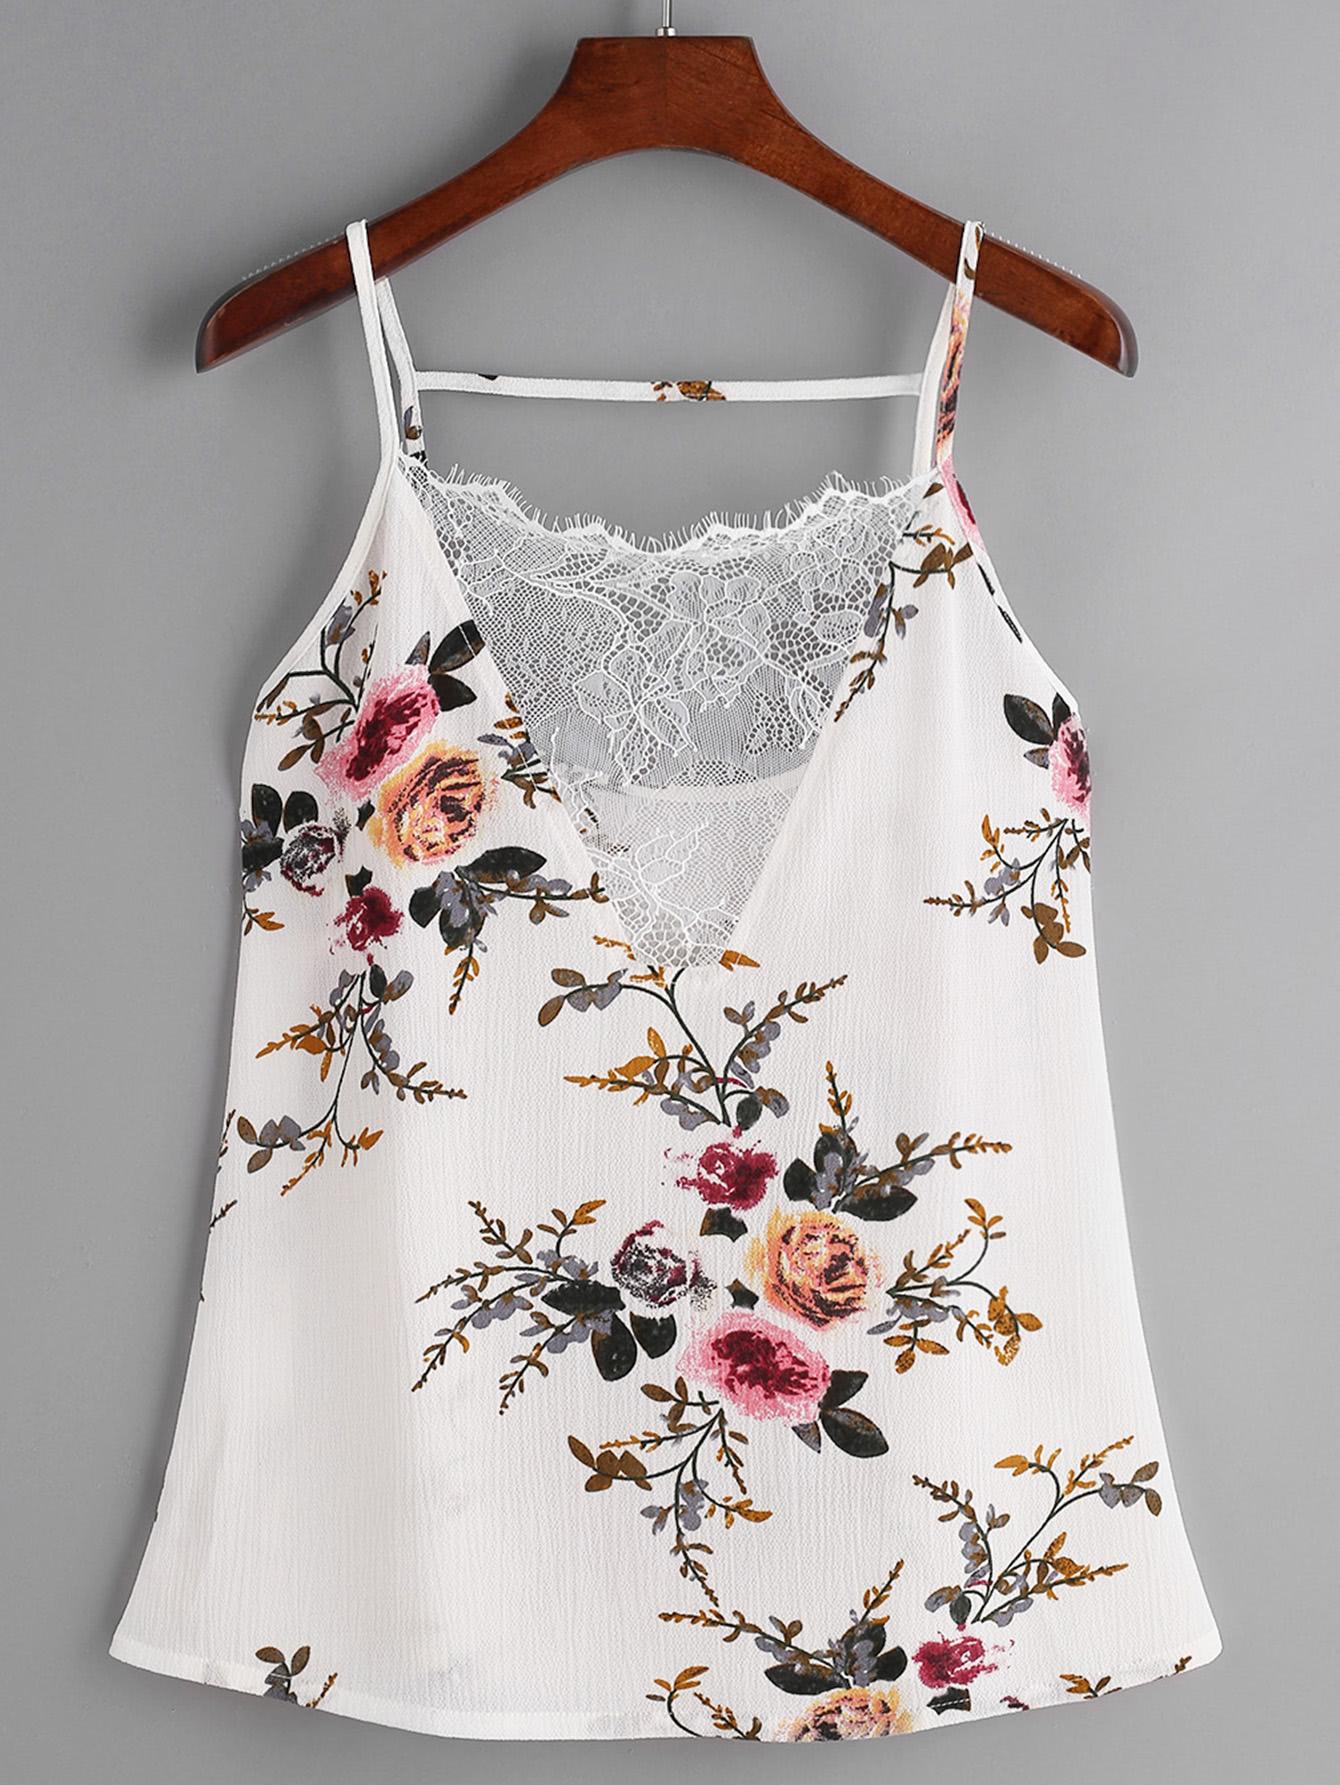 Floral Print Lace V-Neck Cami Top hanky hem floral print cami tank top